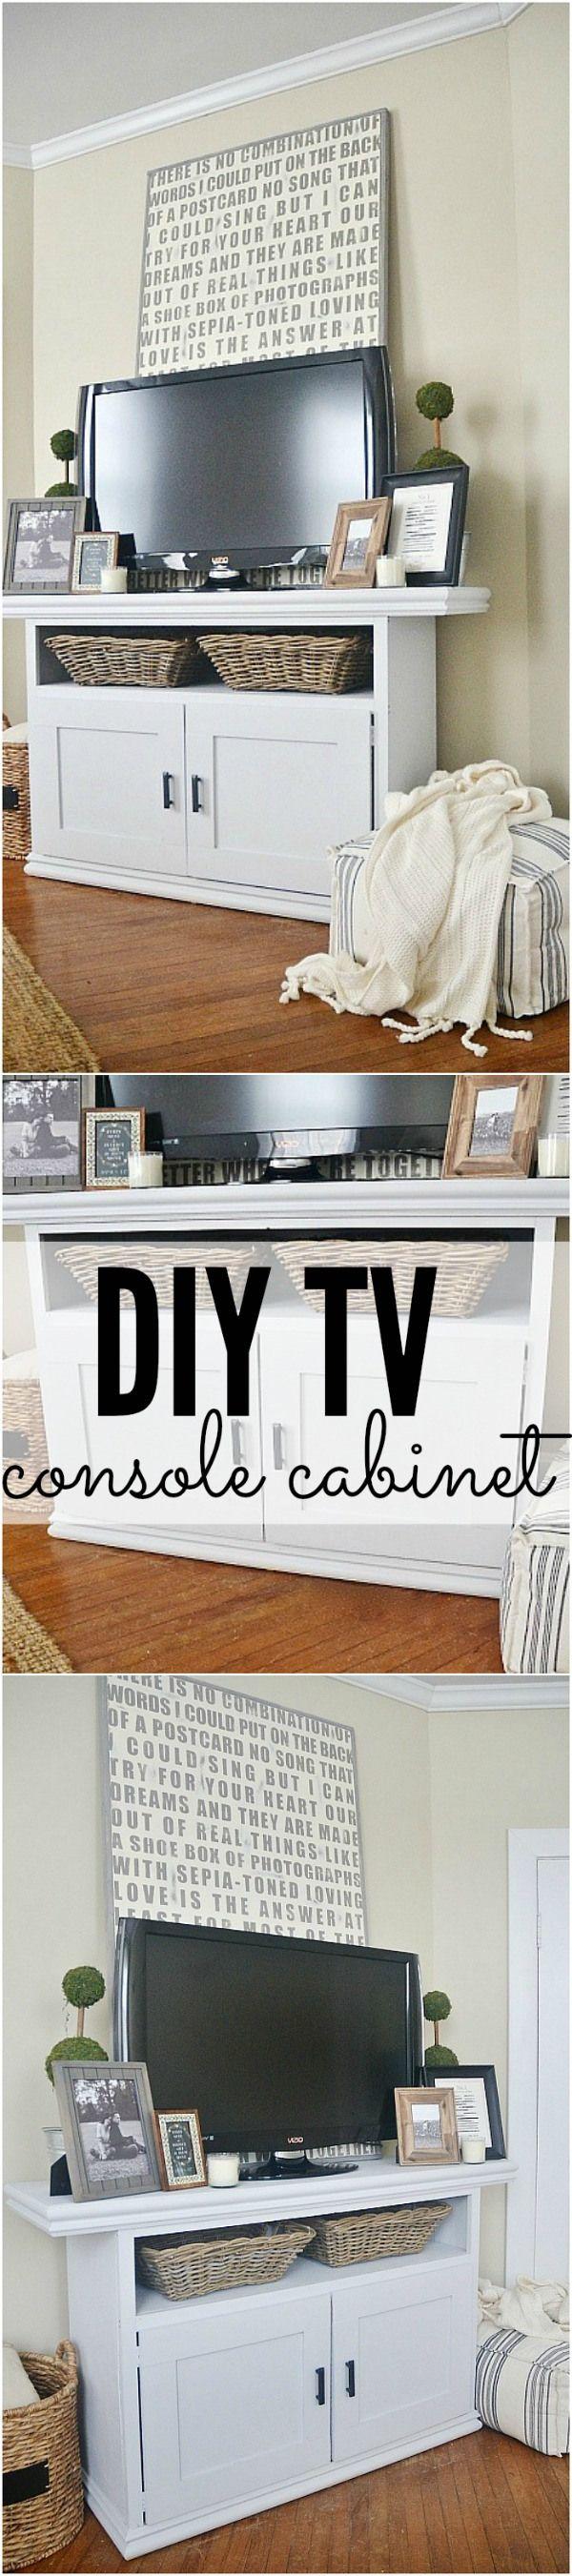 DIY TV Console Cabinet | Repurposed furniture, Tv console ...